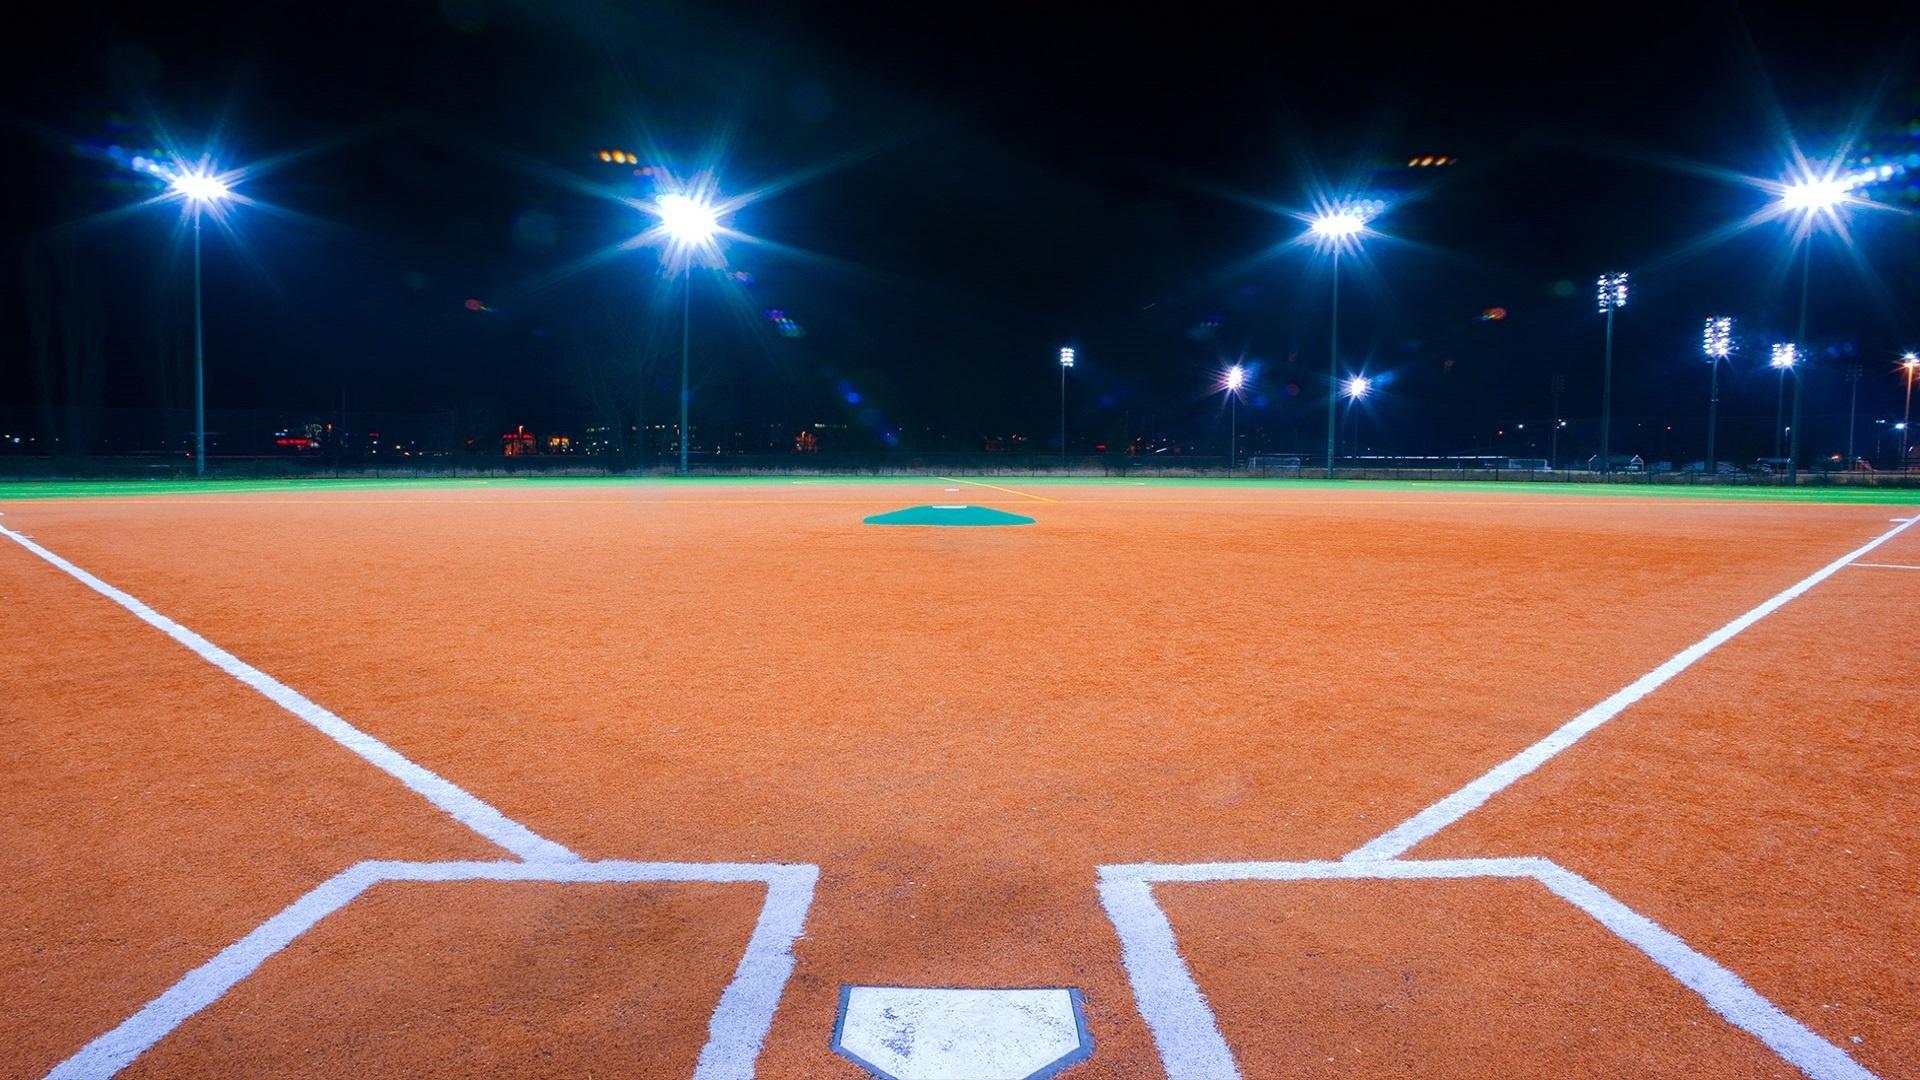 Download Baseball Stadium Wallpaper 1920x1080